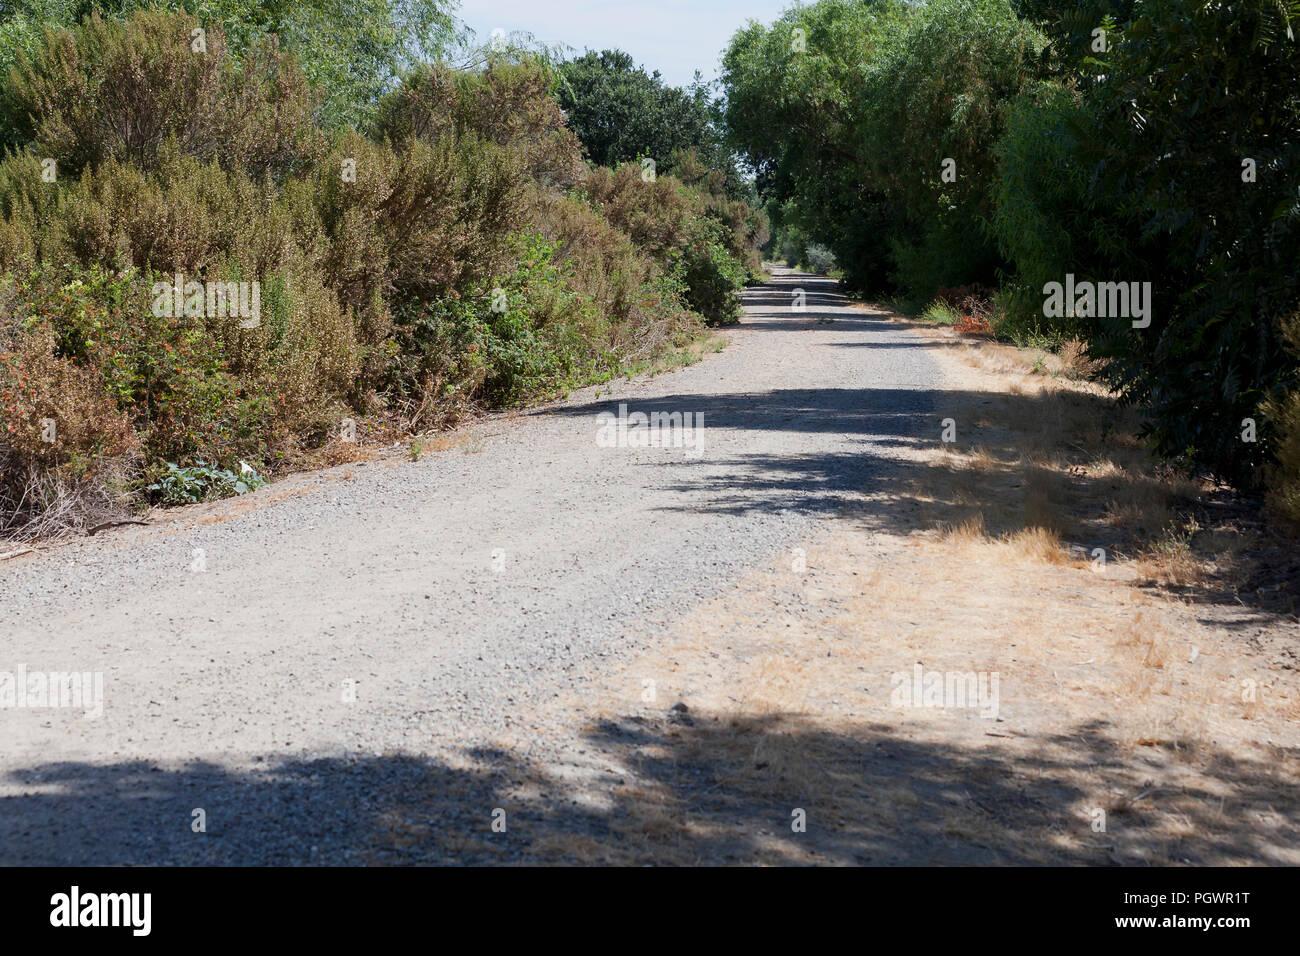 Route de gravier en zone rurale - California USA Photo Stock